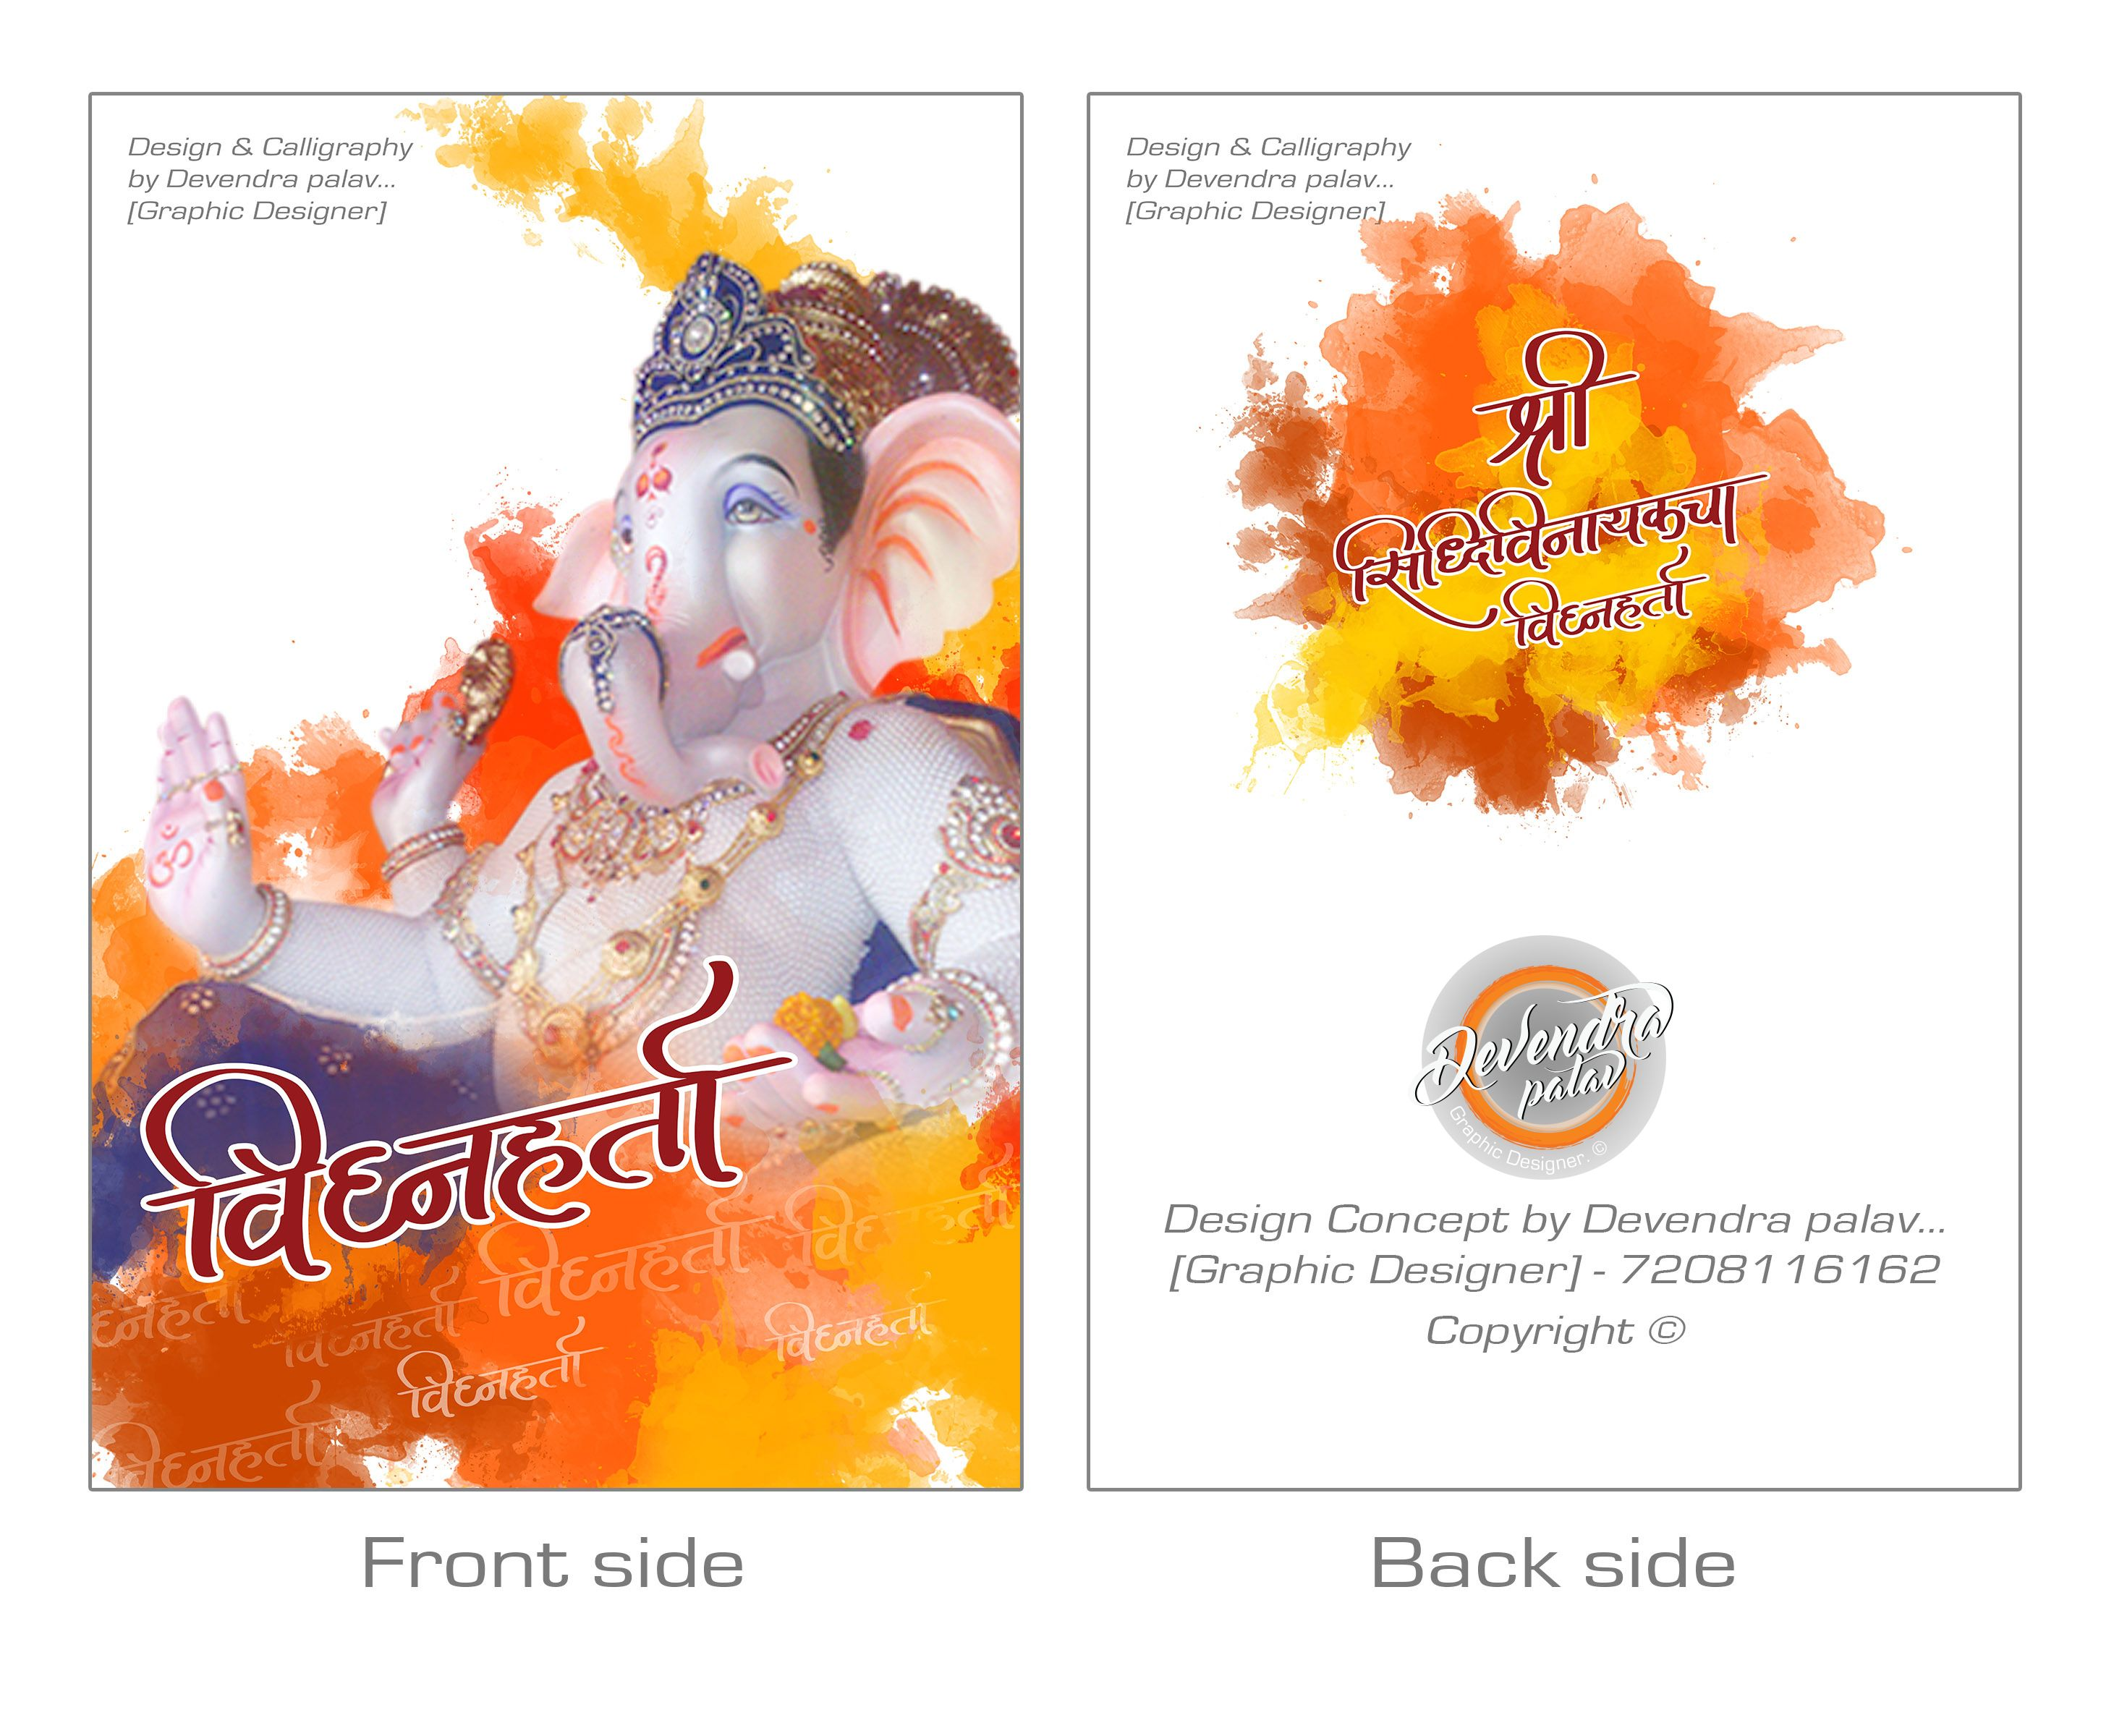 Shirt design concepts - Marathi Calligraphy T Shirt Design Concept Calligraphy By Devendra Palav Graphic Designer